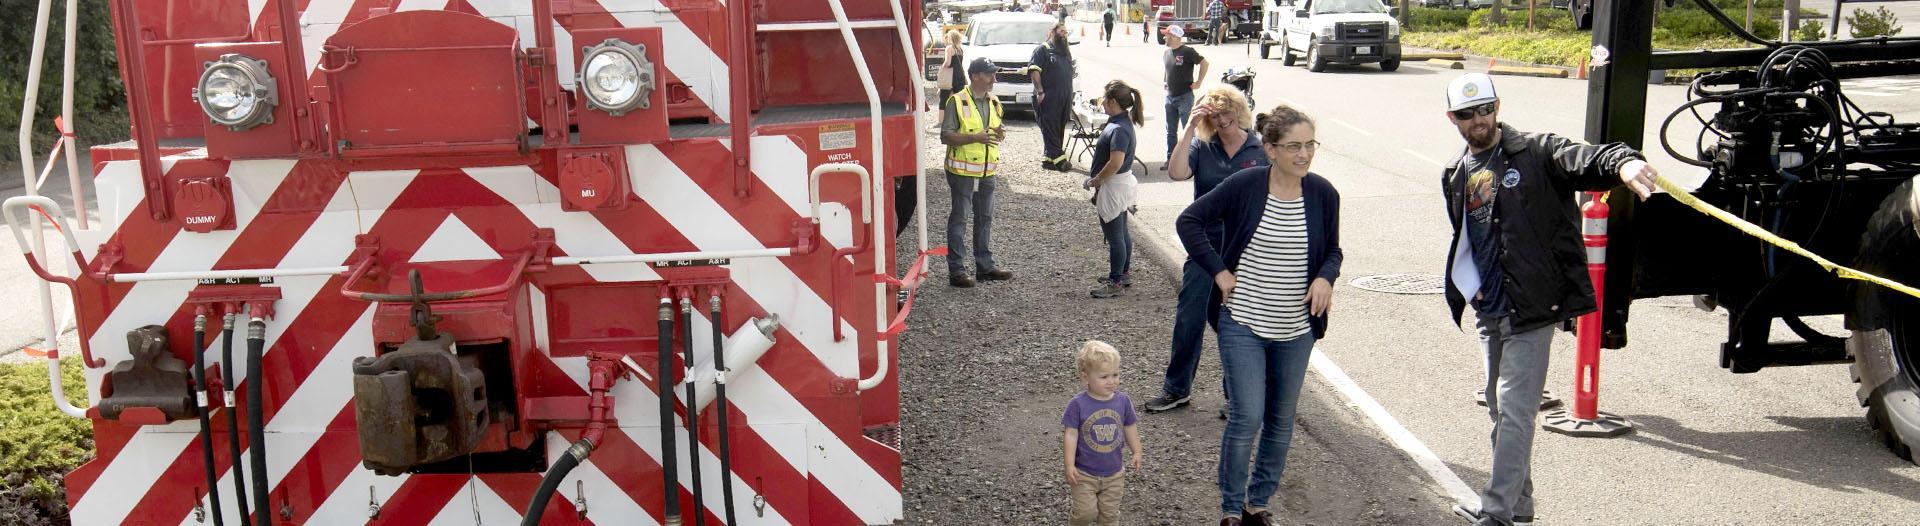 People walking around a Tacoma Rail engine.